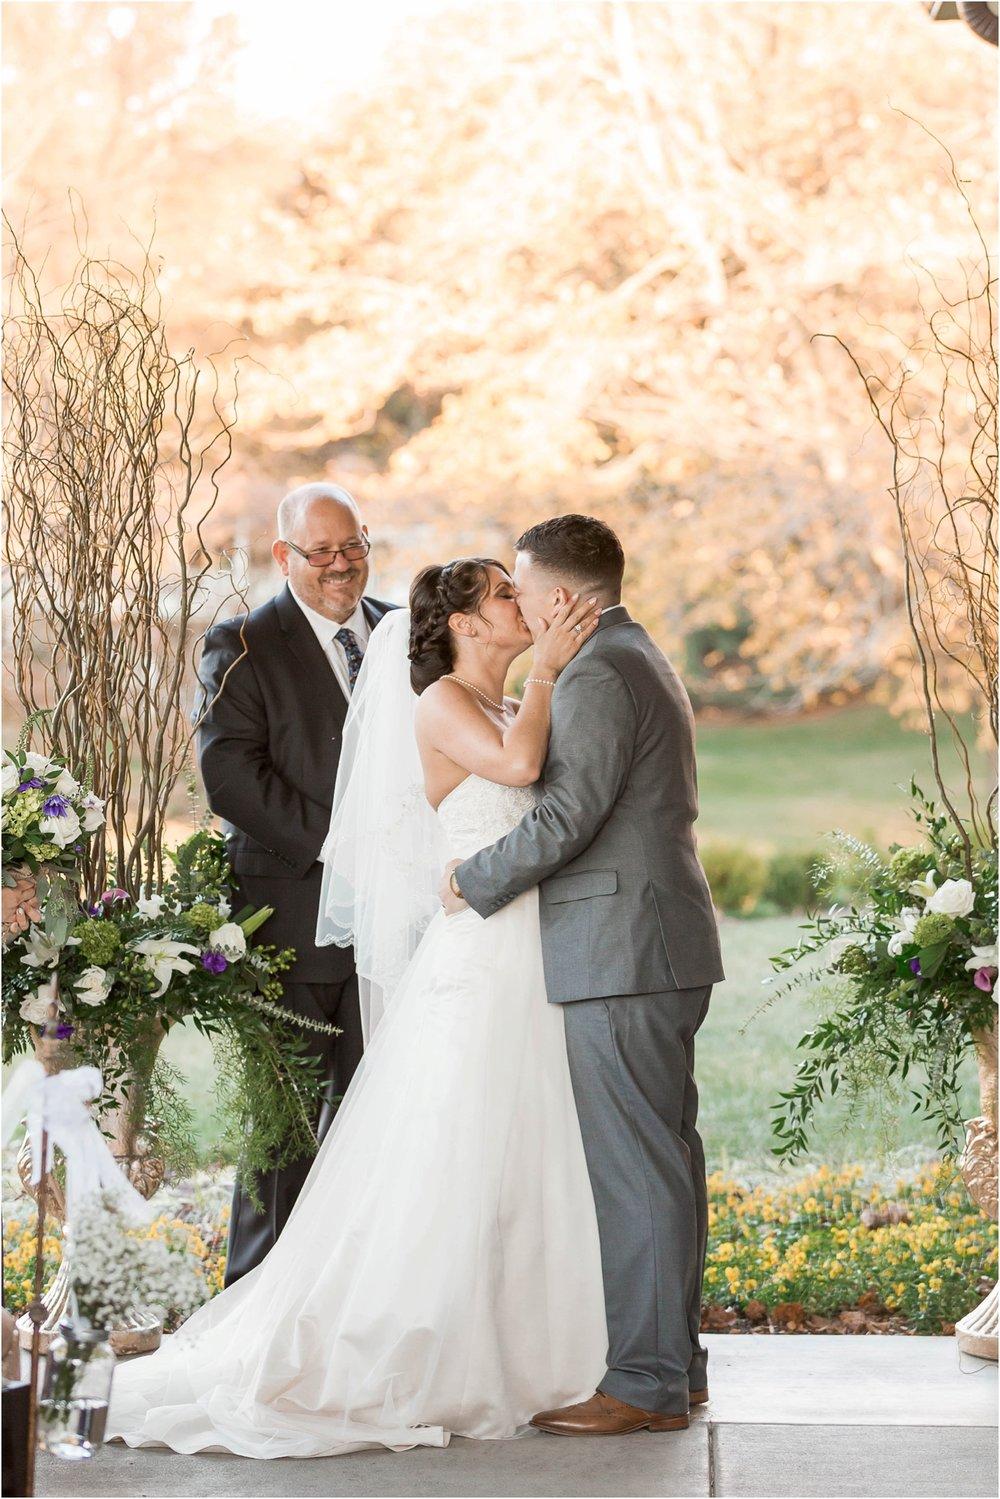 Hobbits-Glen-Golf-Course-Wedding-866.jpg